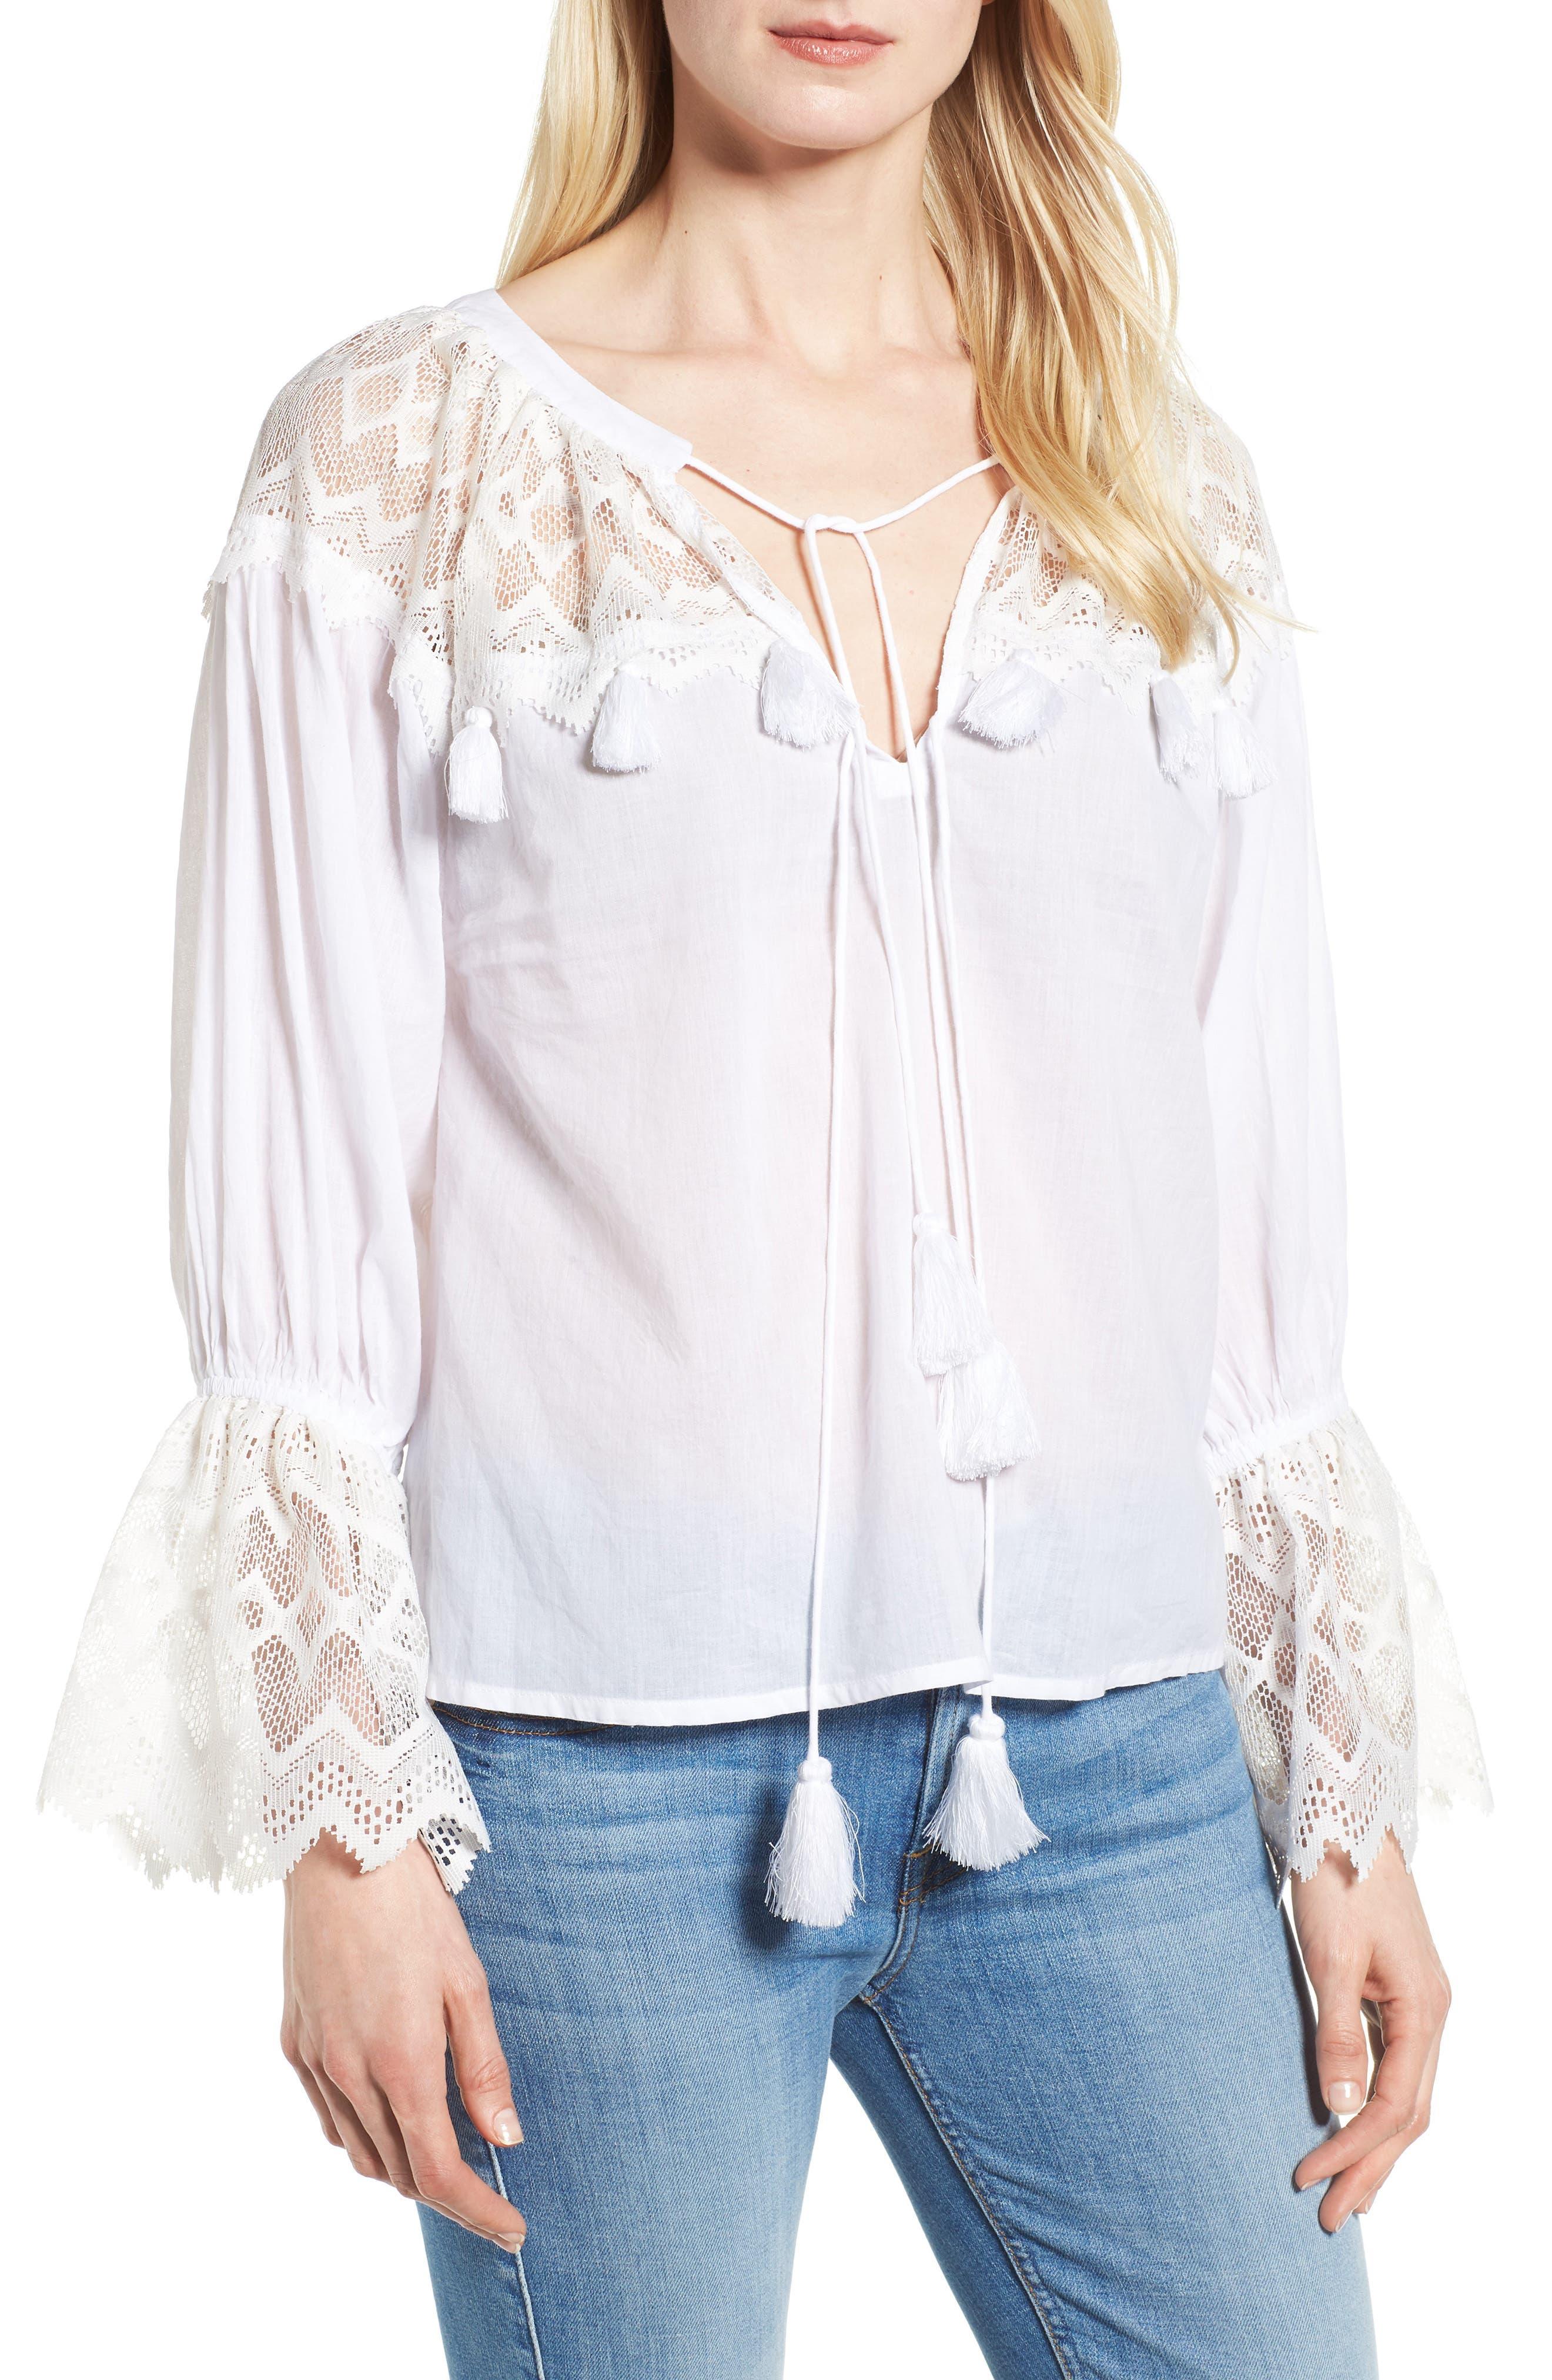 Berkley White Lace Cotton Blend Top,                             Main thumbnail 1, color,                             WHITE